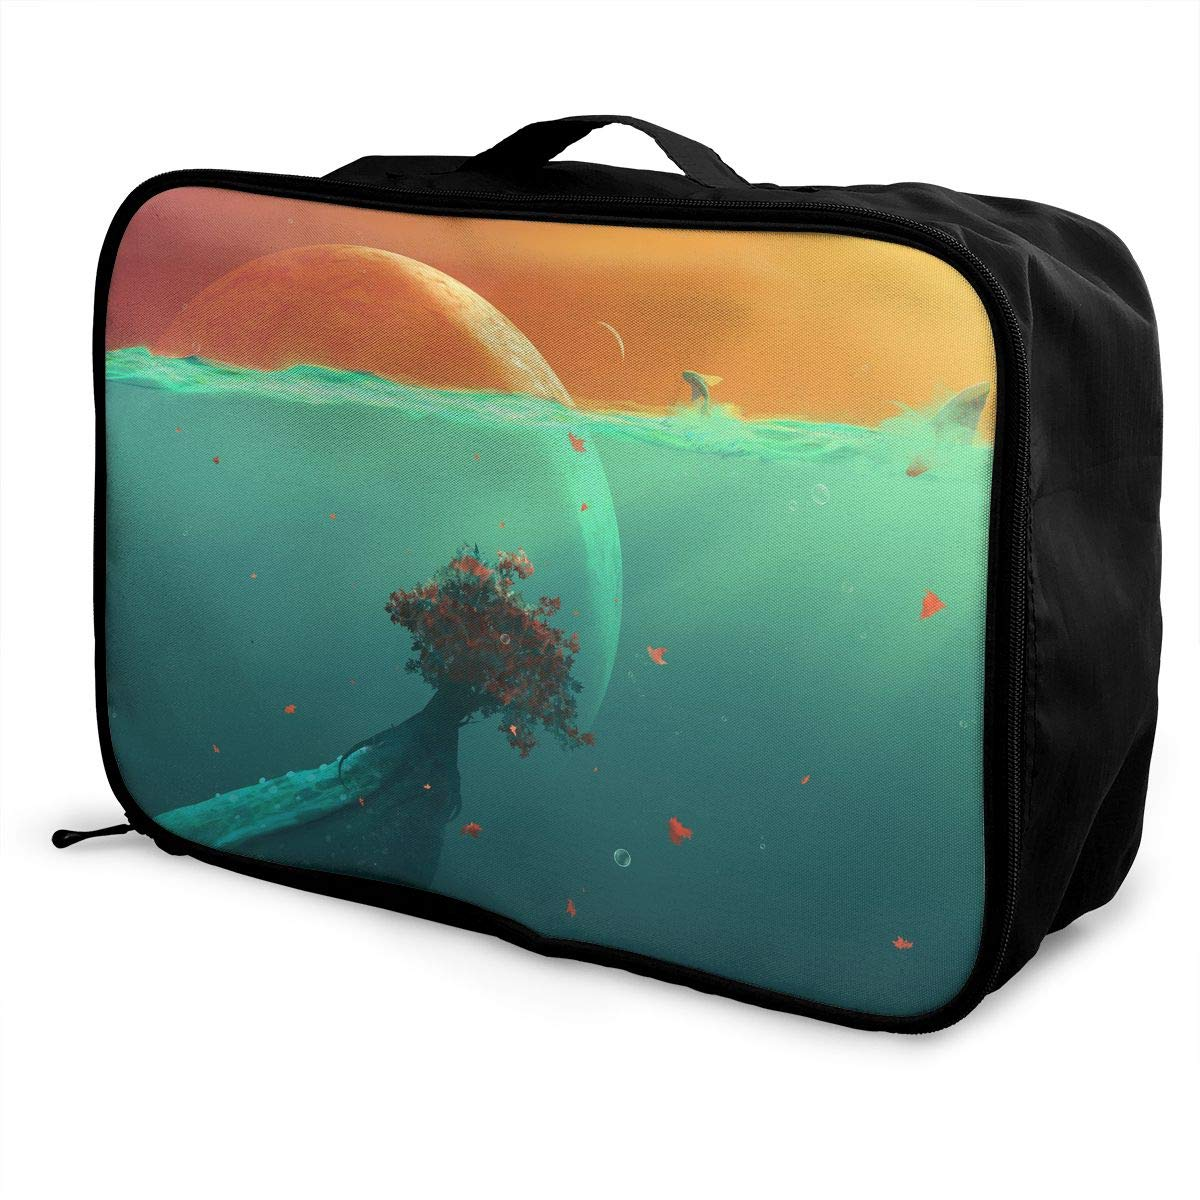 Travel Luggage Duffle Bag Lightweight Portable Handbag Deep Ocean Planet Fish Large Capacity Waterproof Foldable Storage Tote